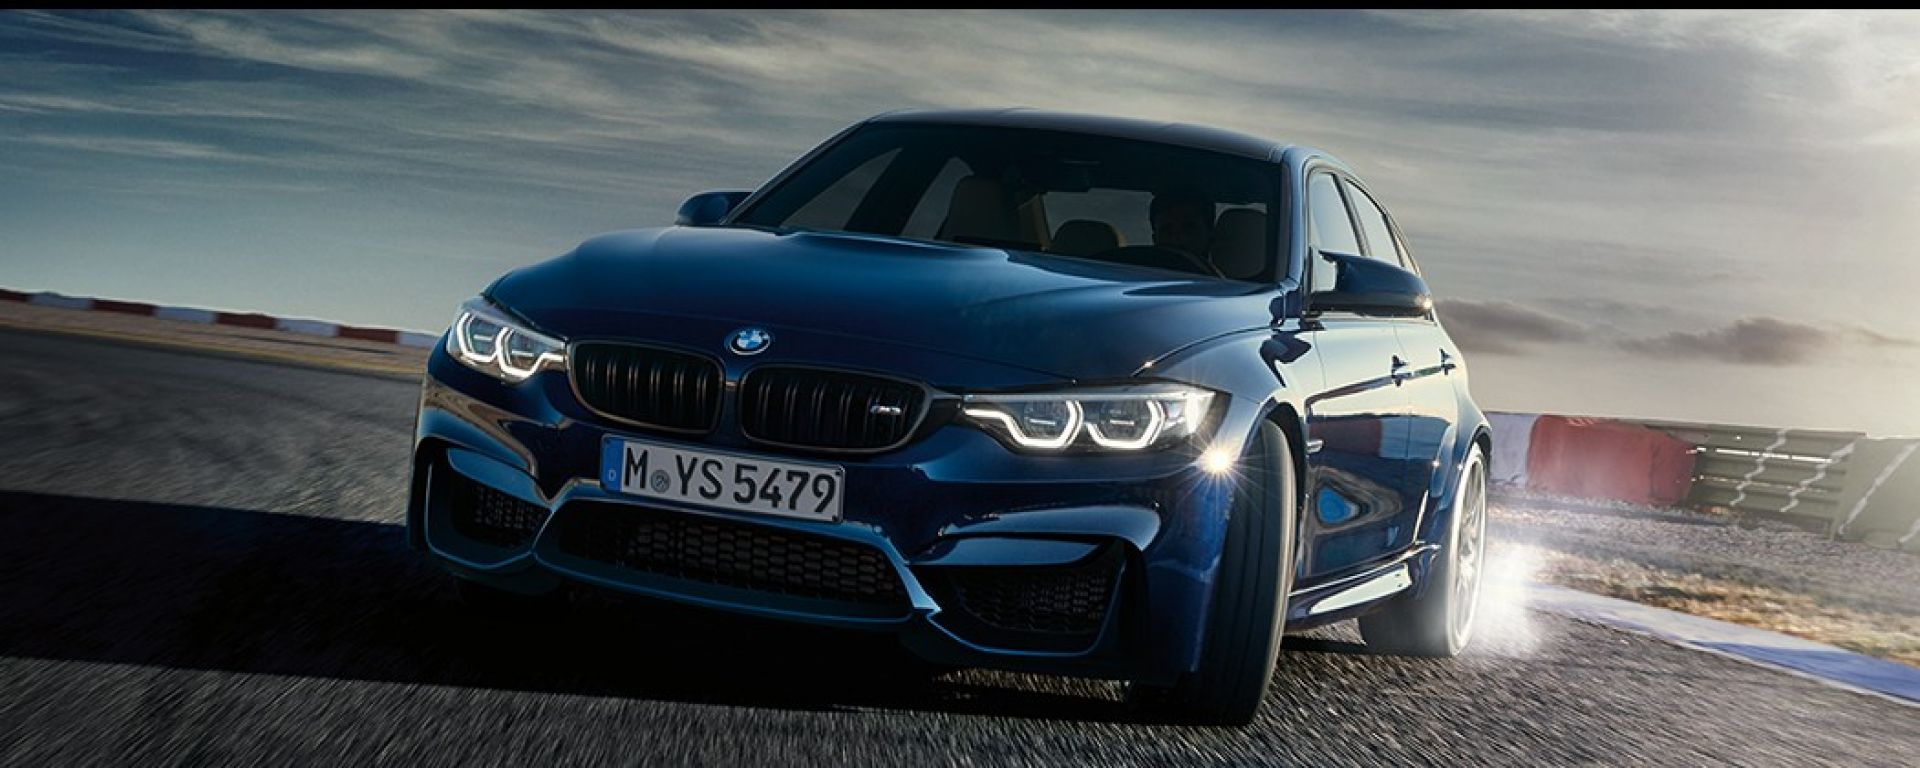 BMW M3 2017: DEBUTTA IL RESTYLING